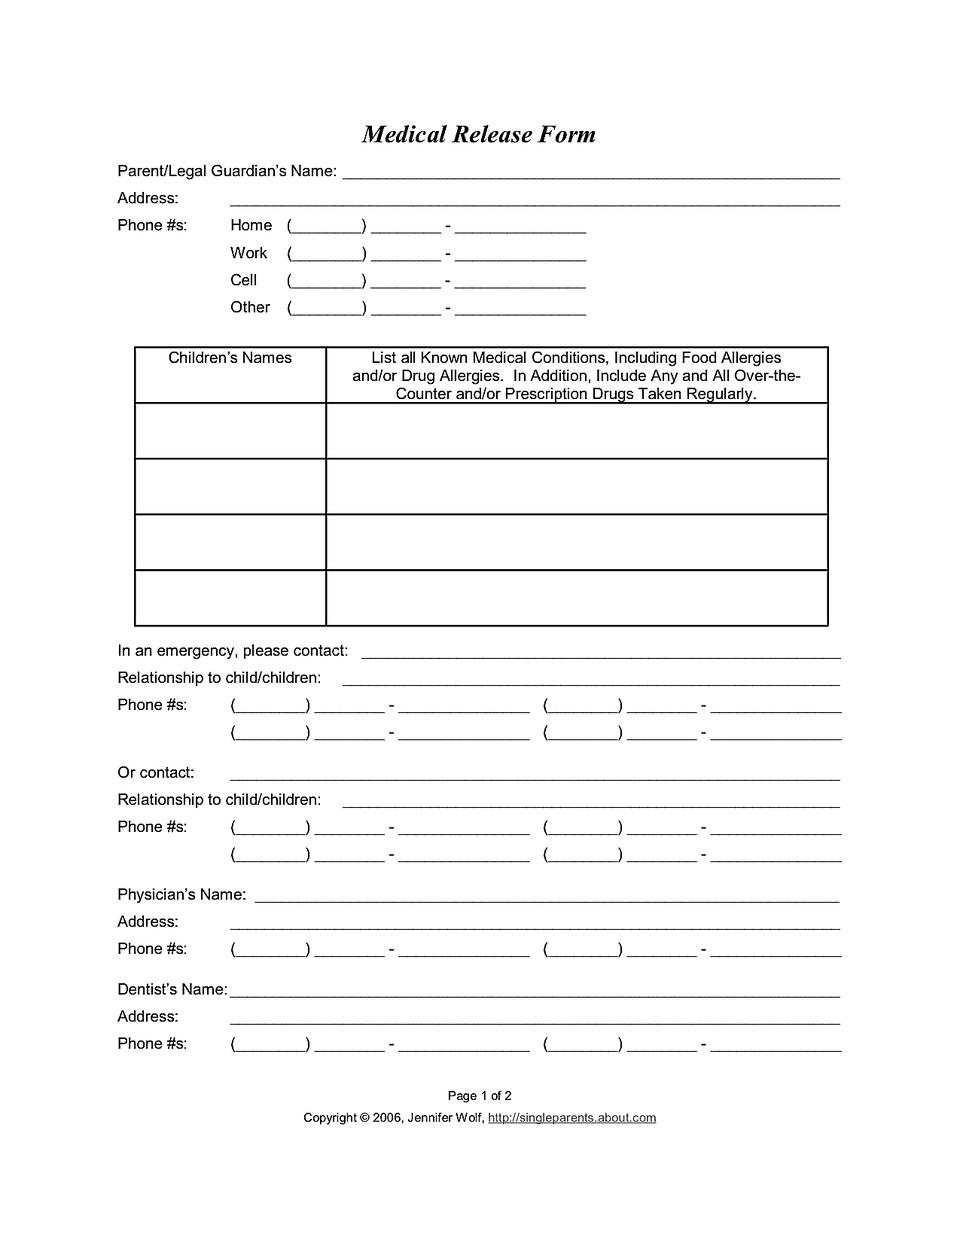 015 Medical Release Form Medicalreleaseform1 Template Ideas - Free Printable Medical Release Form